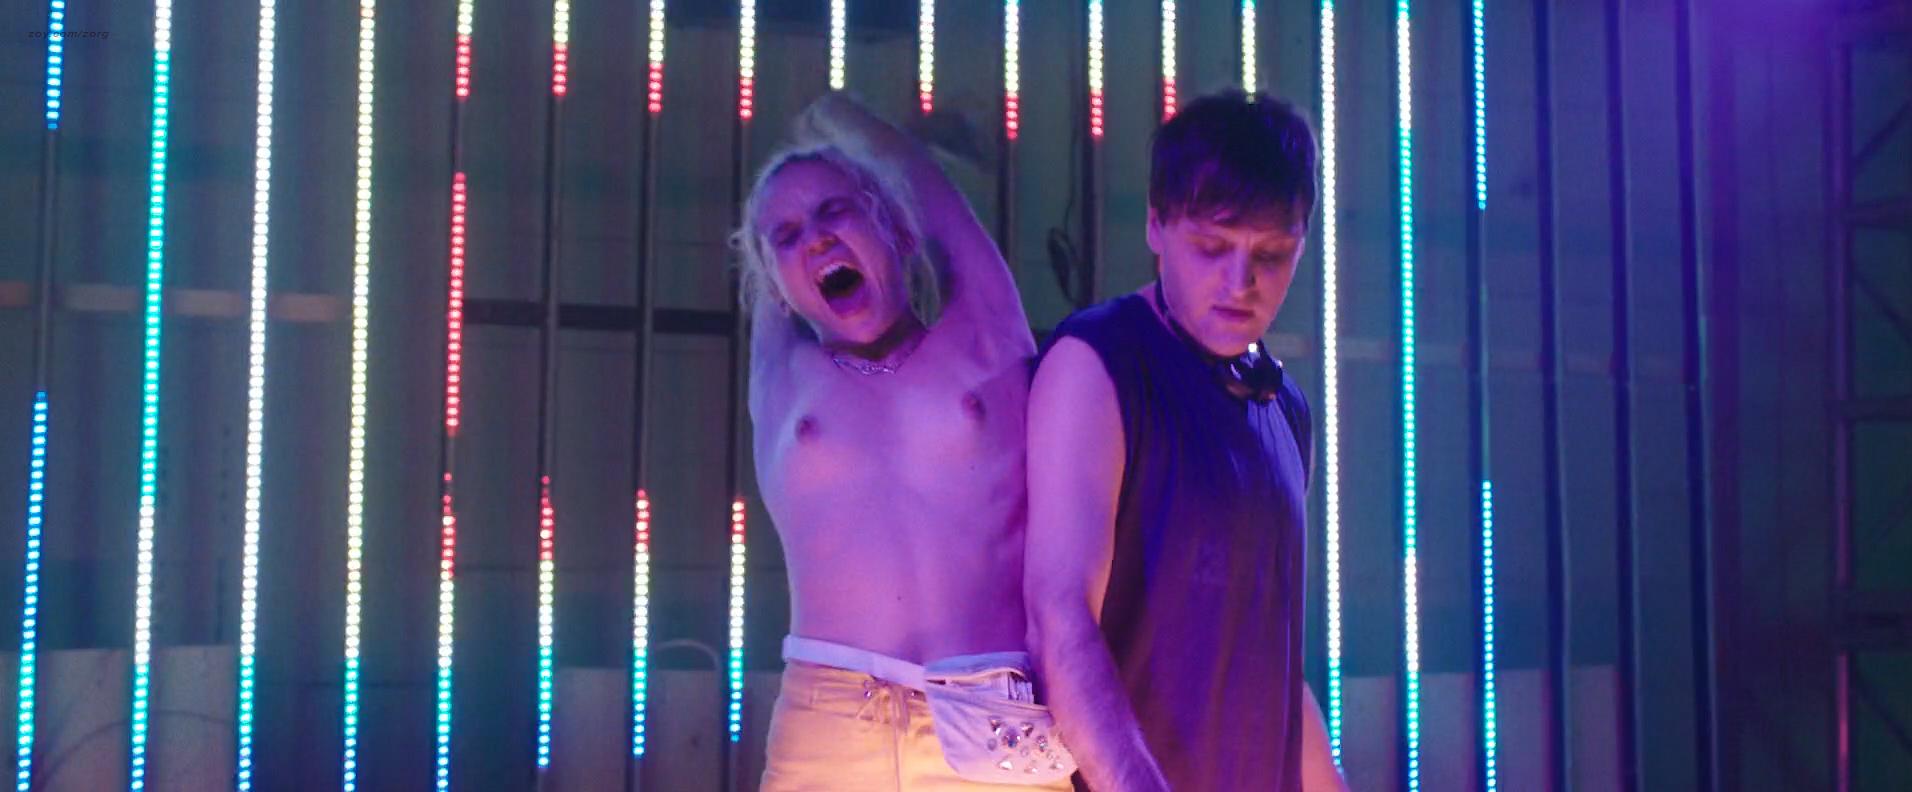 Morgan Saylor nude topless explicit blow job and India Menuez nude - White Girl (2016) HD 1080p (2)